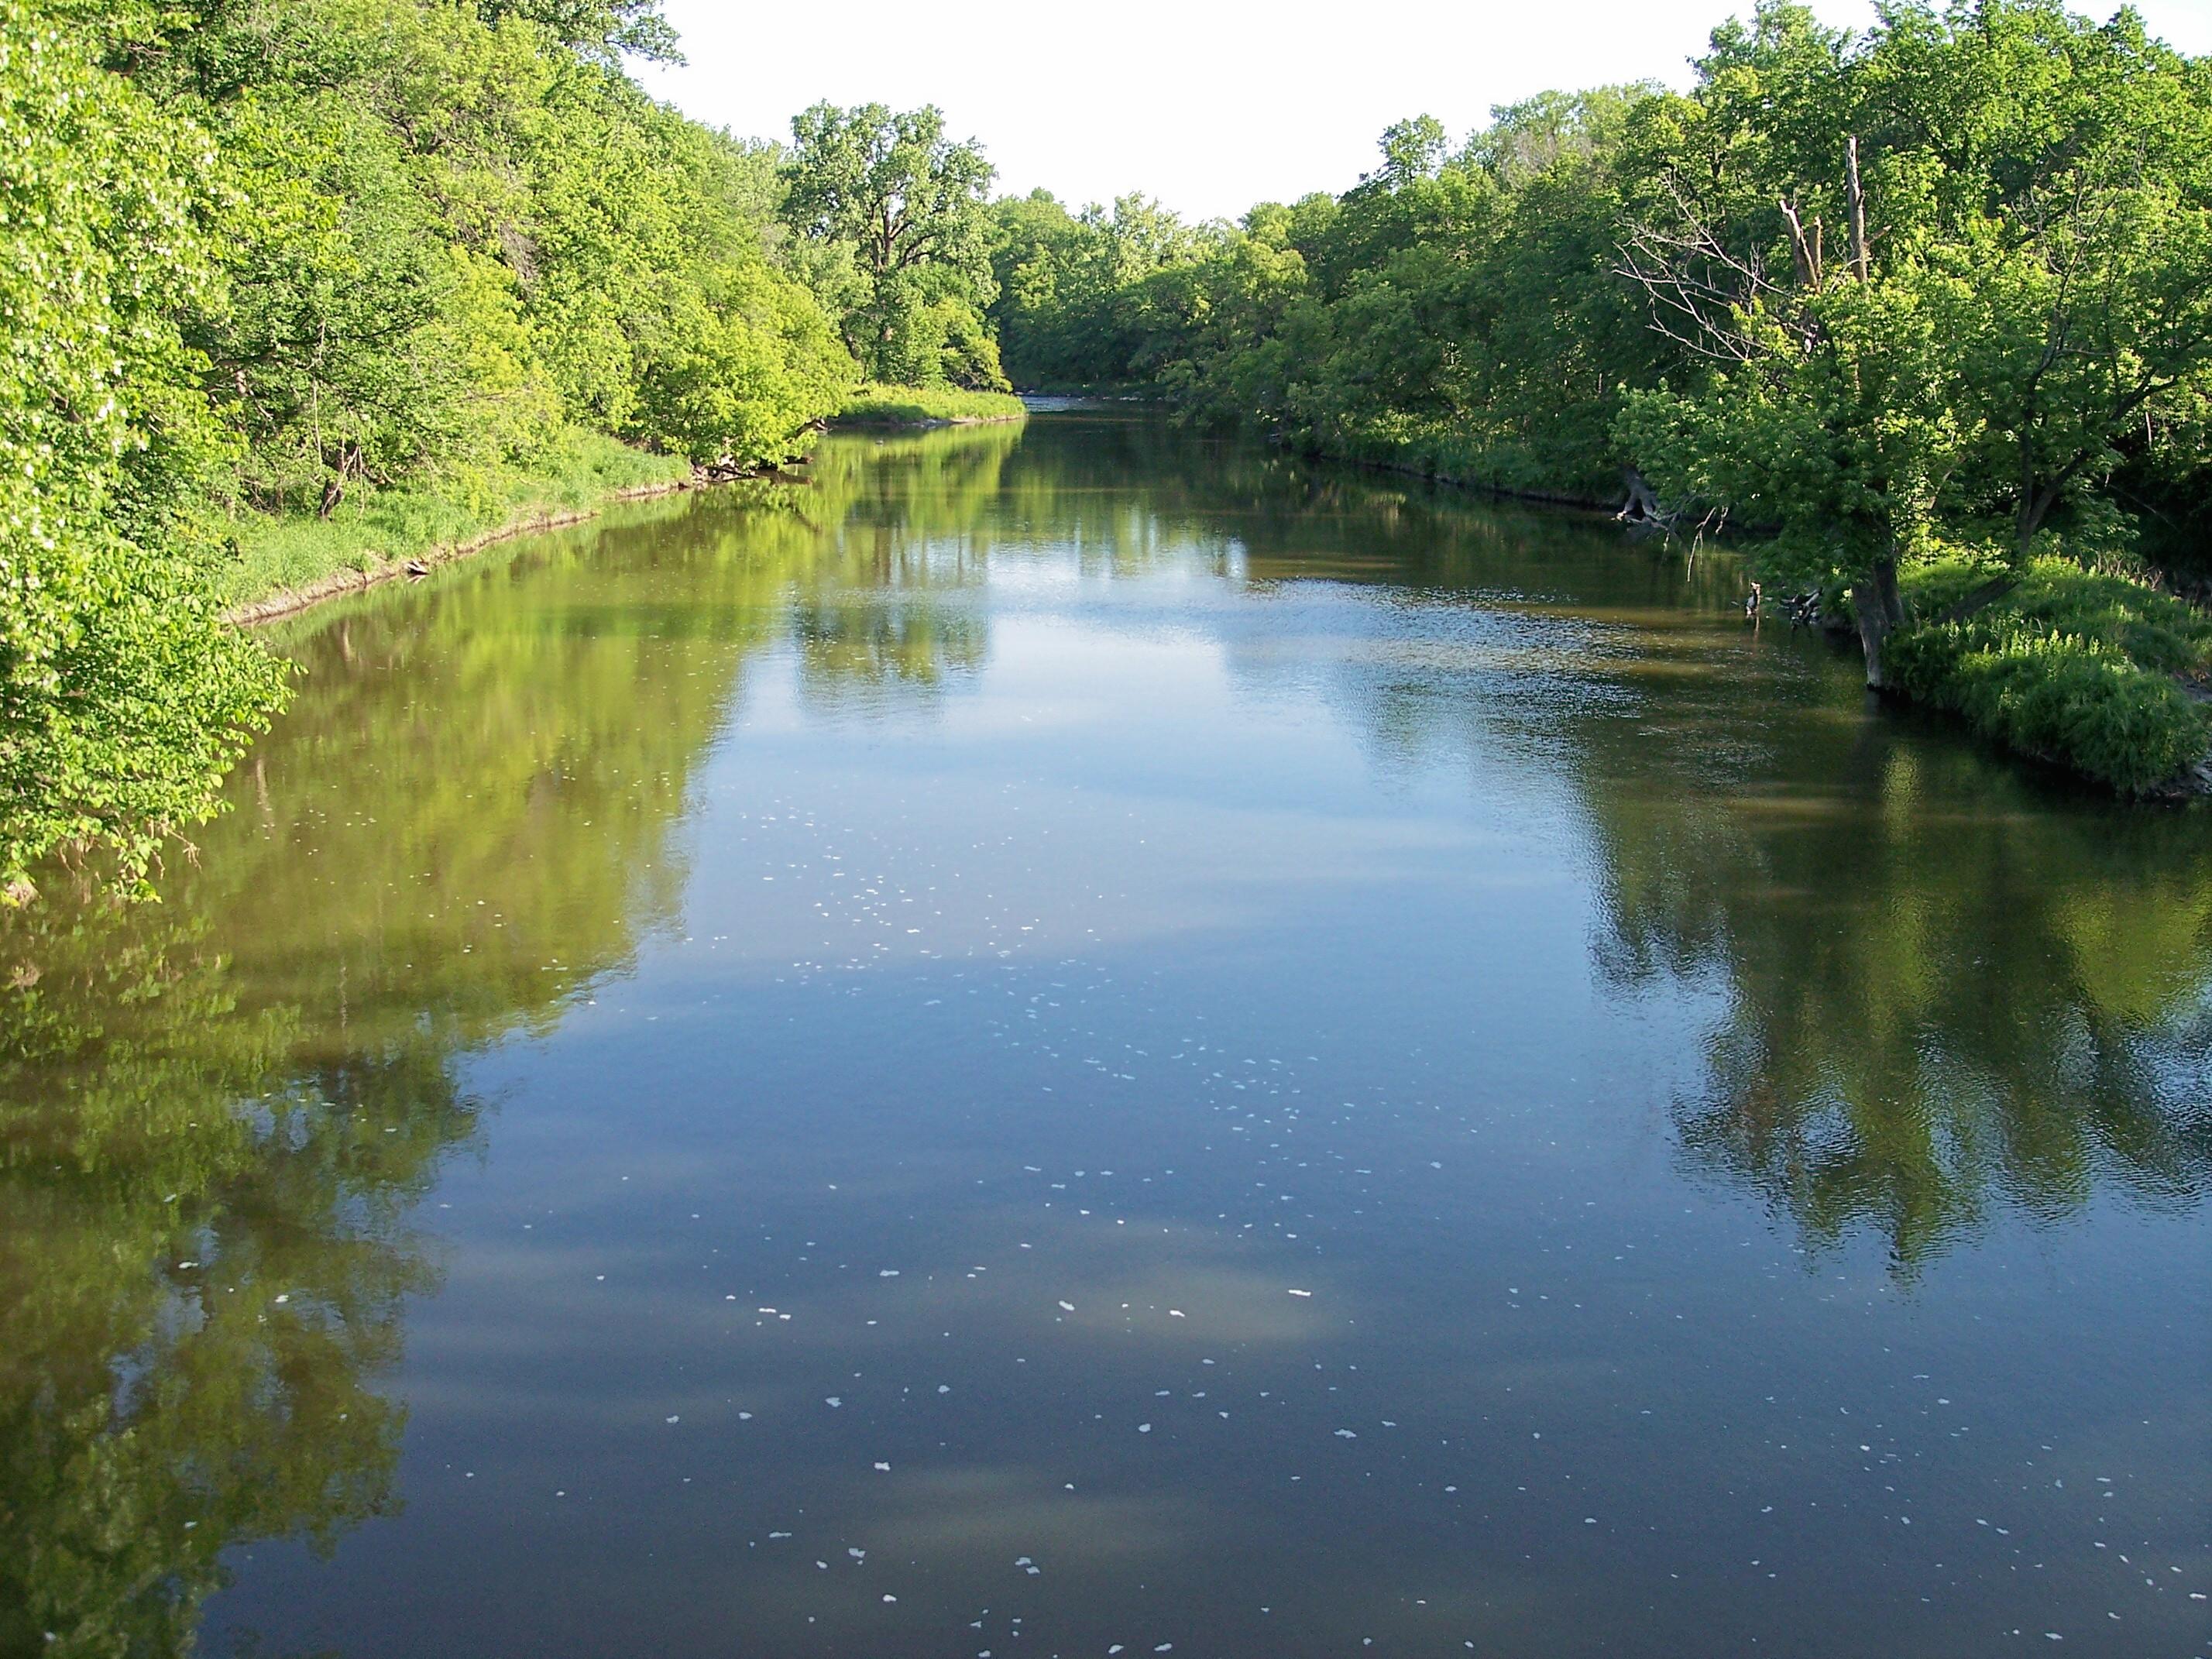 File:Yellow Medicine River.jpg - Wikimedia Commons